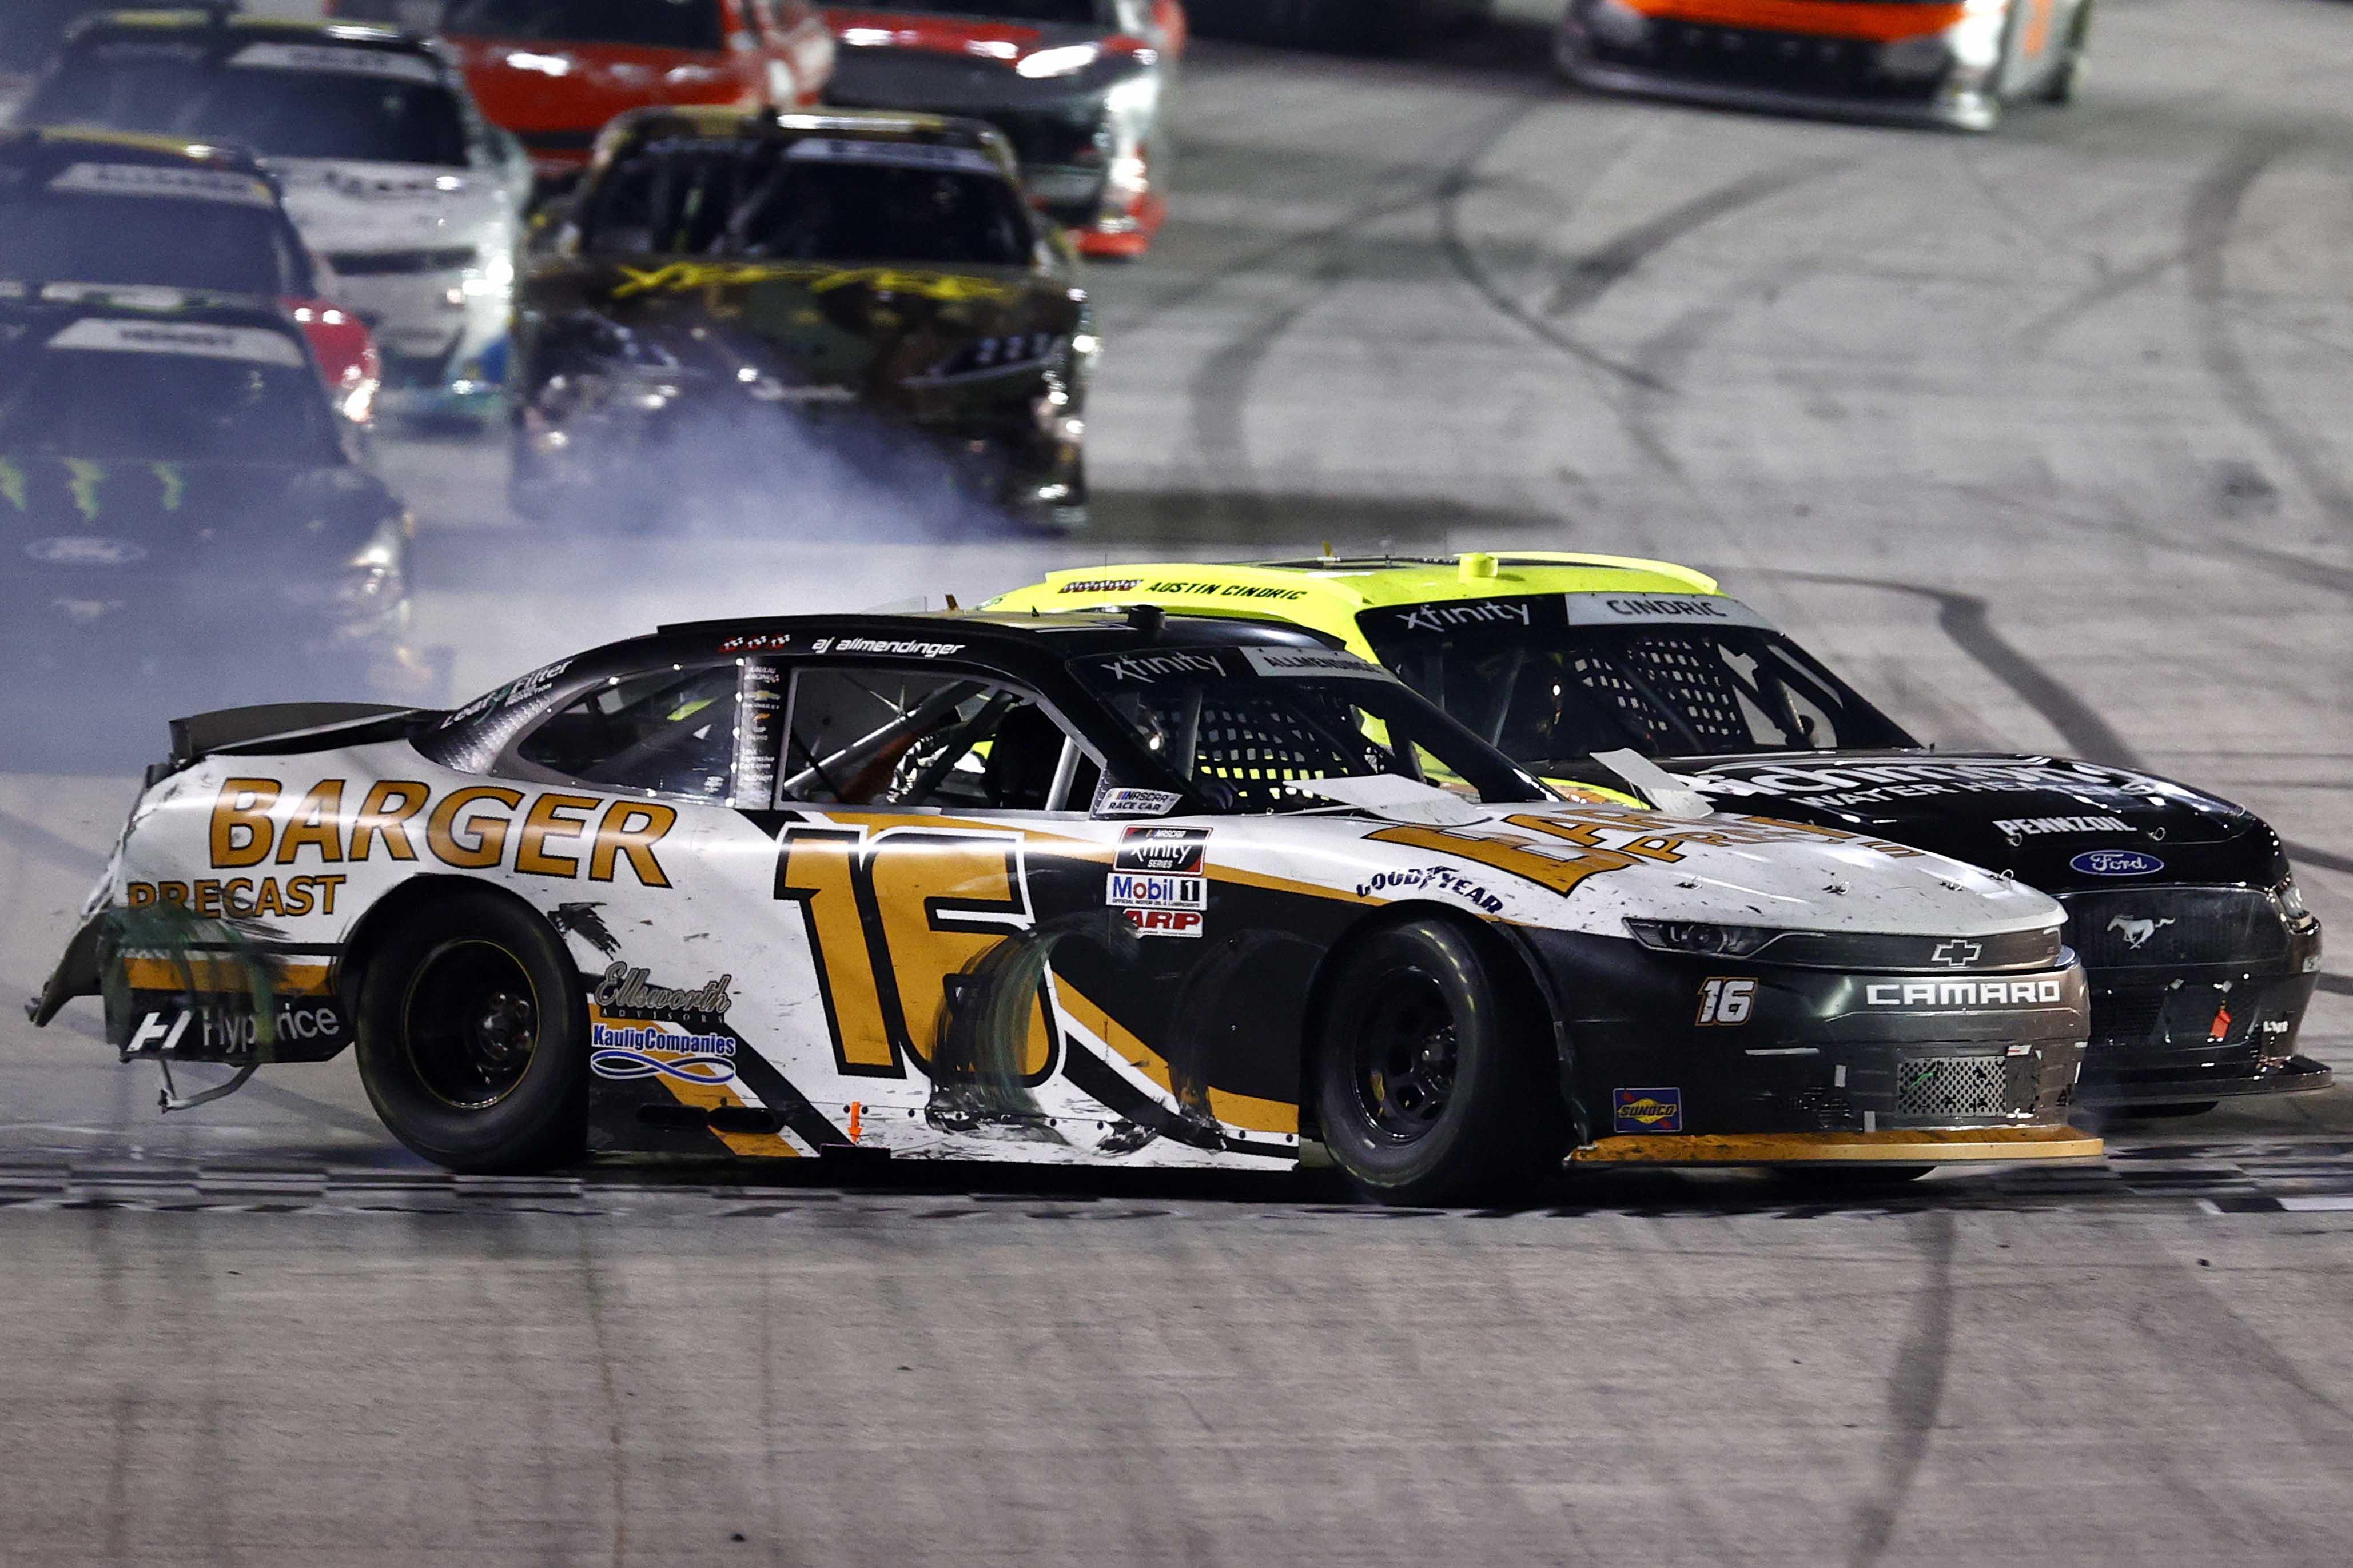 Aj Allmendinger, Austin Cindric crash at Bristol Motor Speedway finish line - NASCAR Xfinity Series